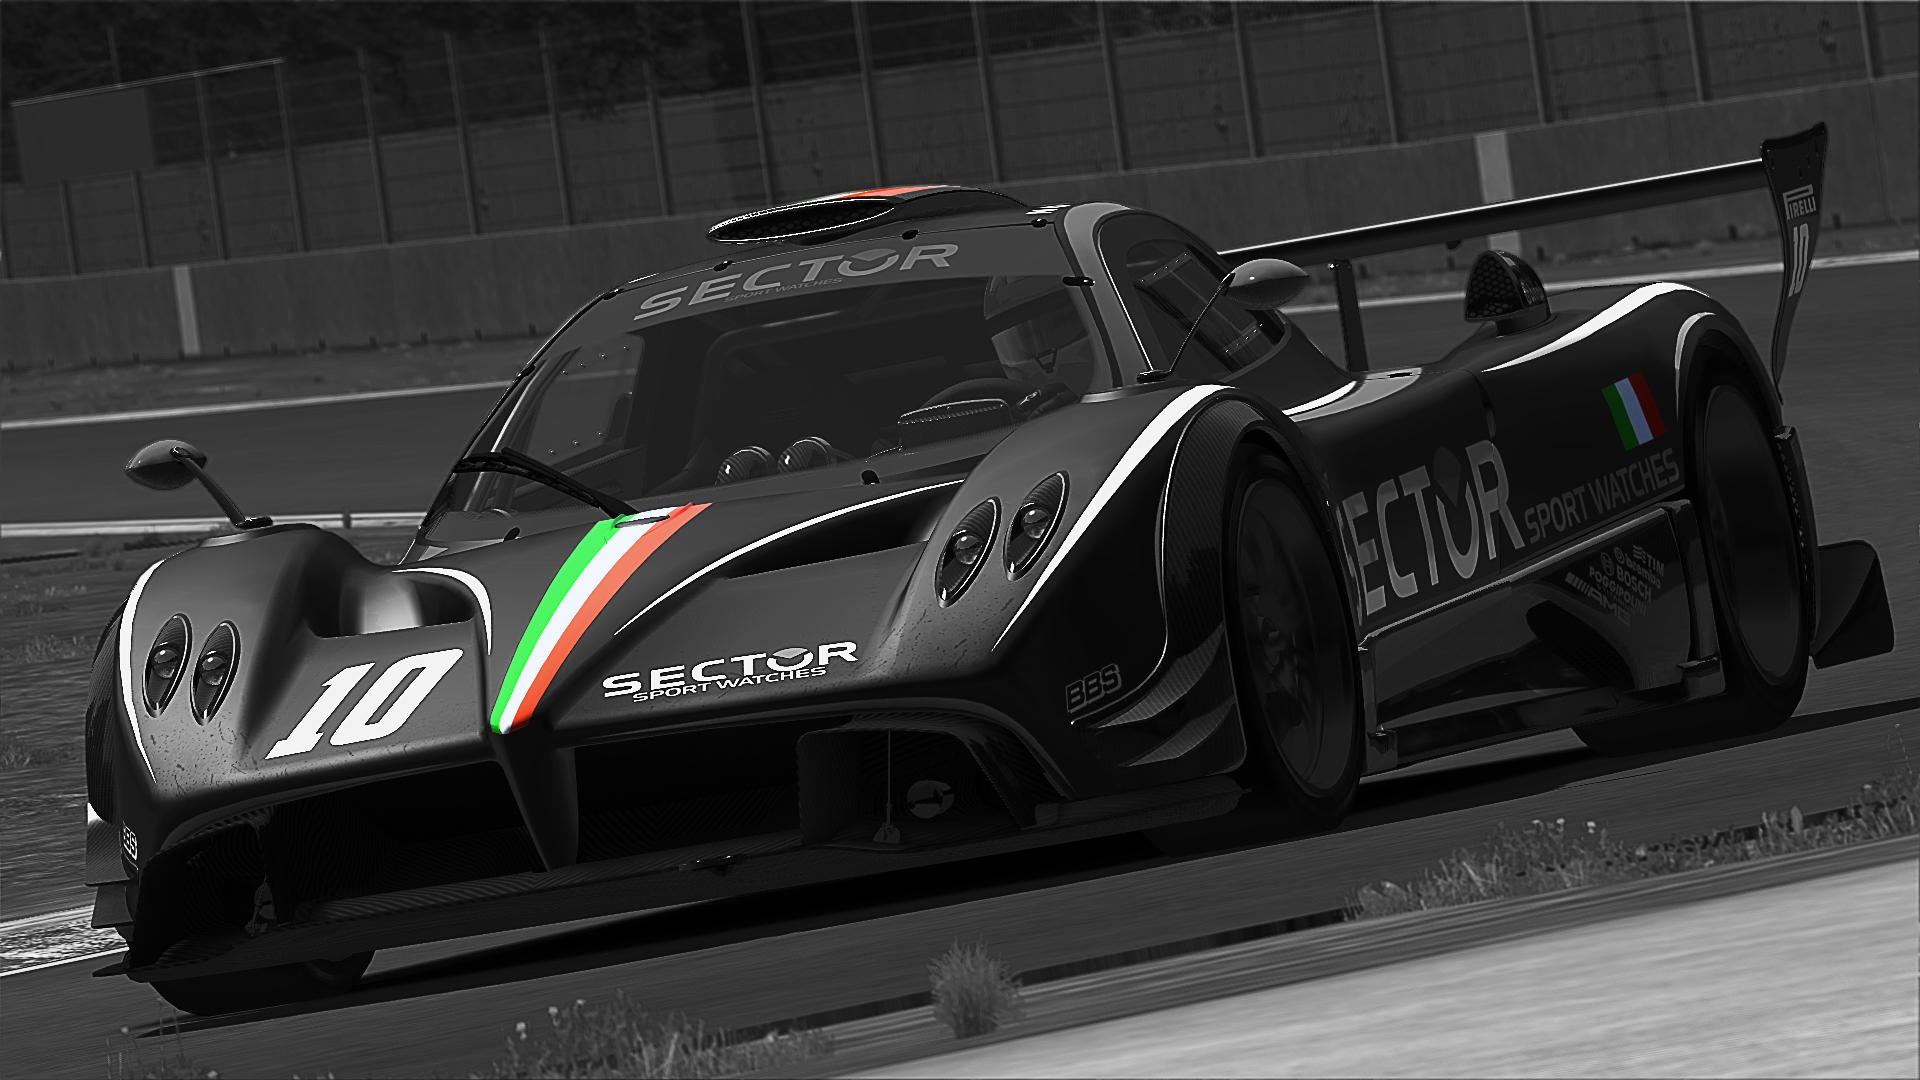 Team Sector Italia